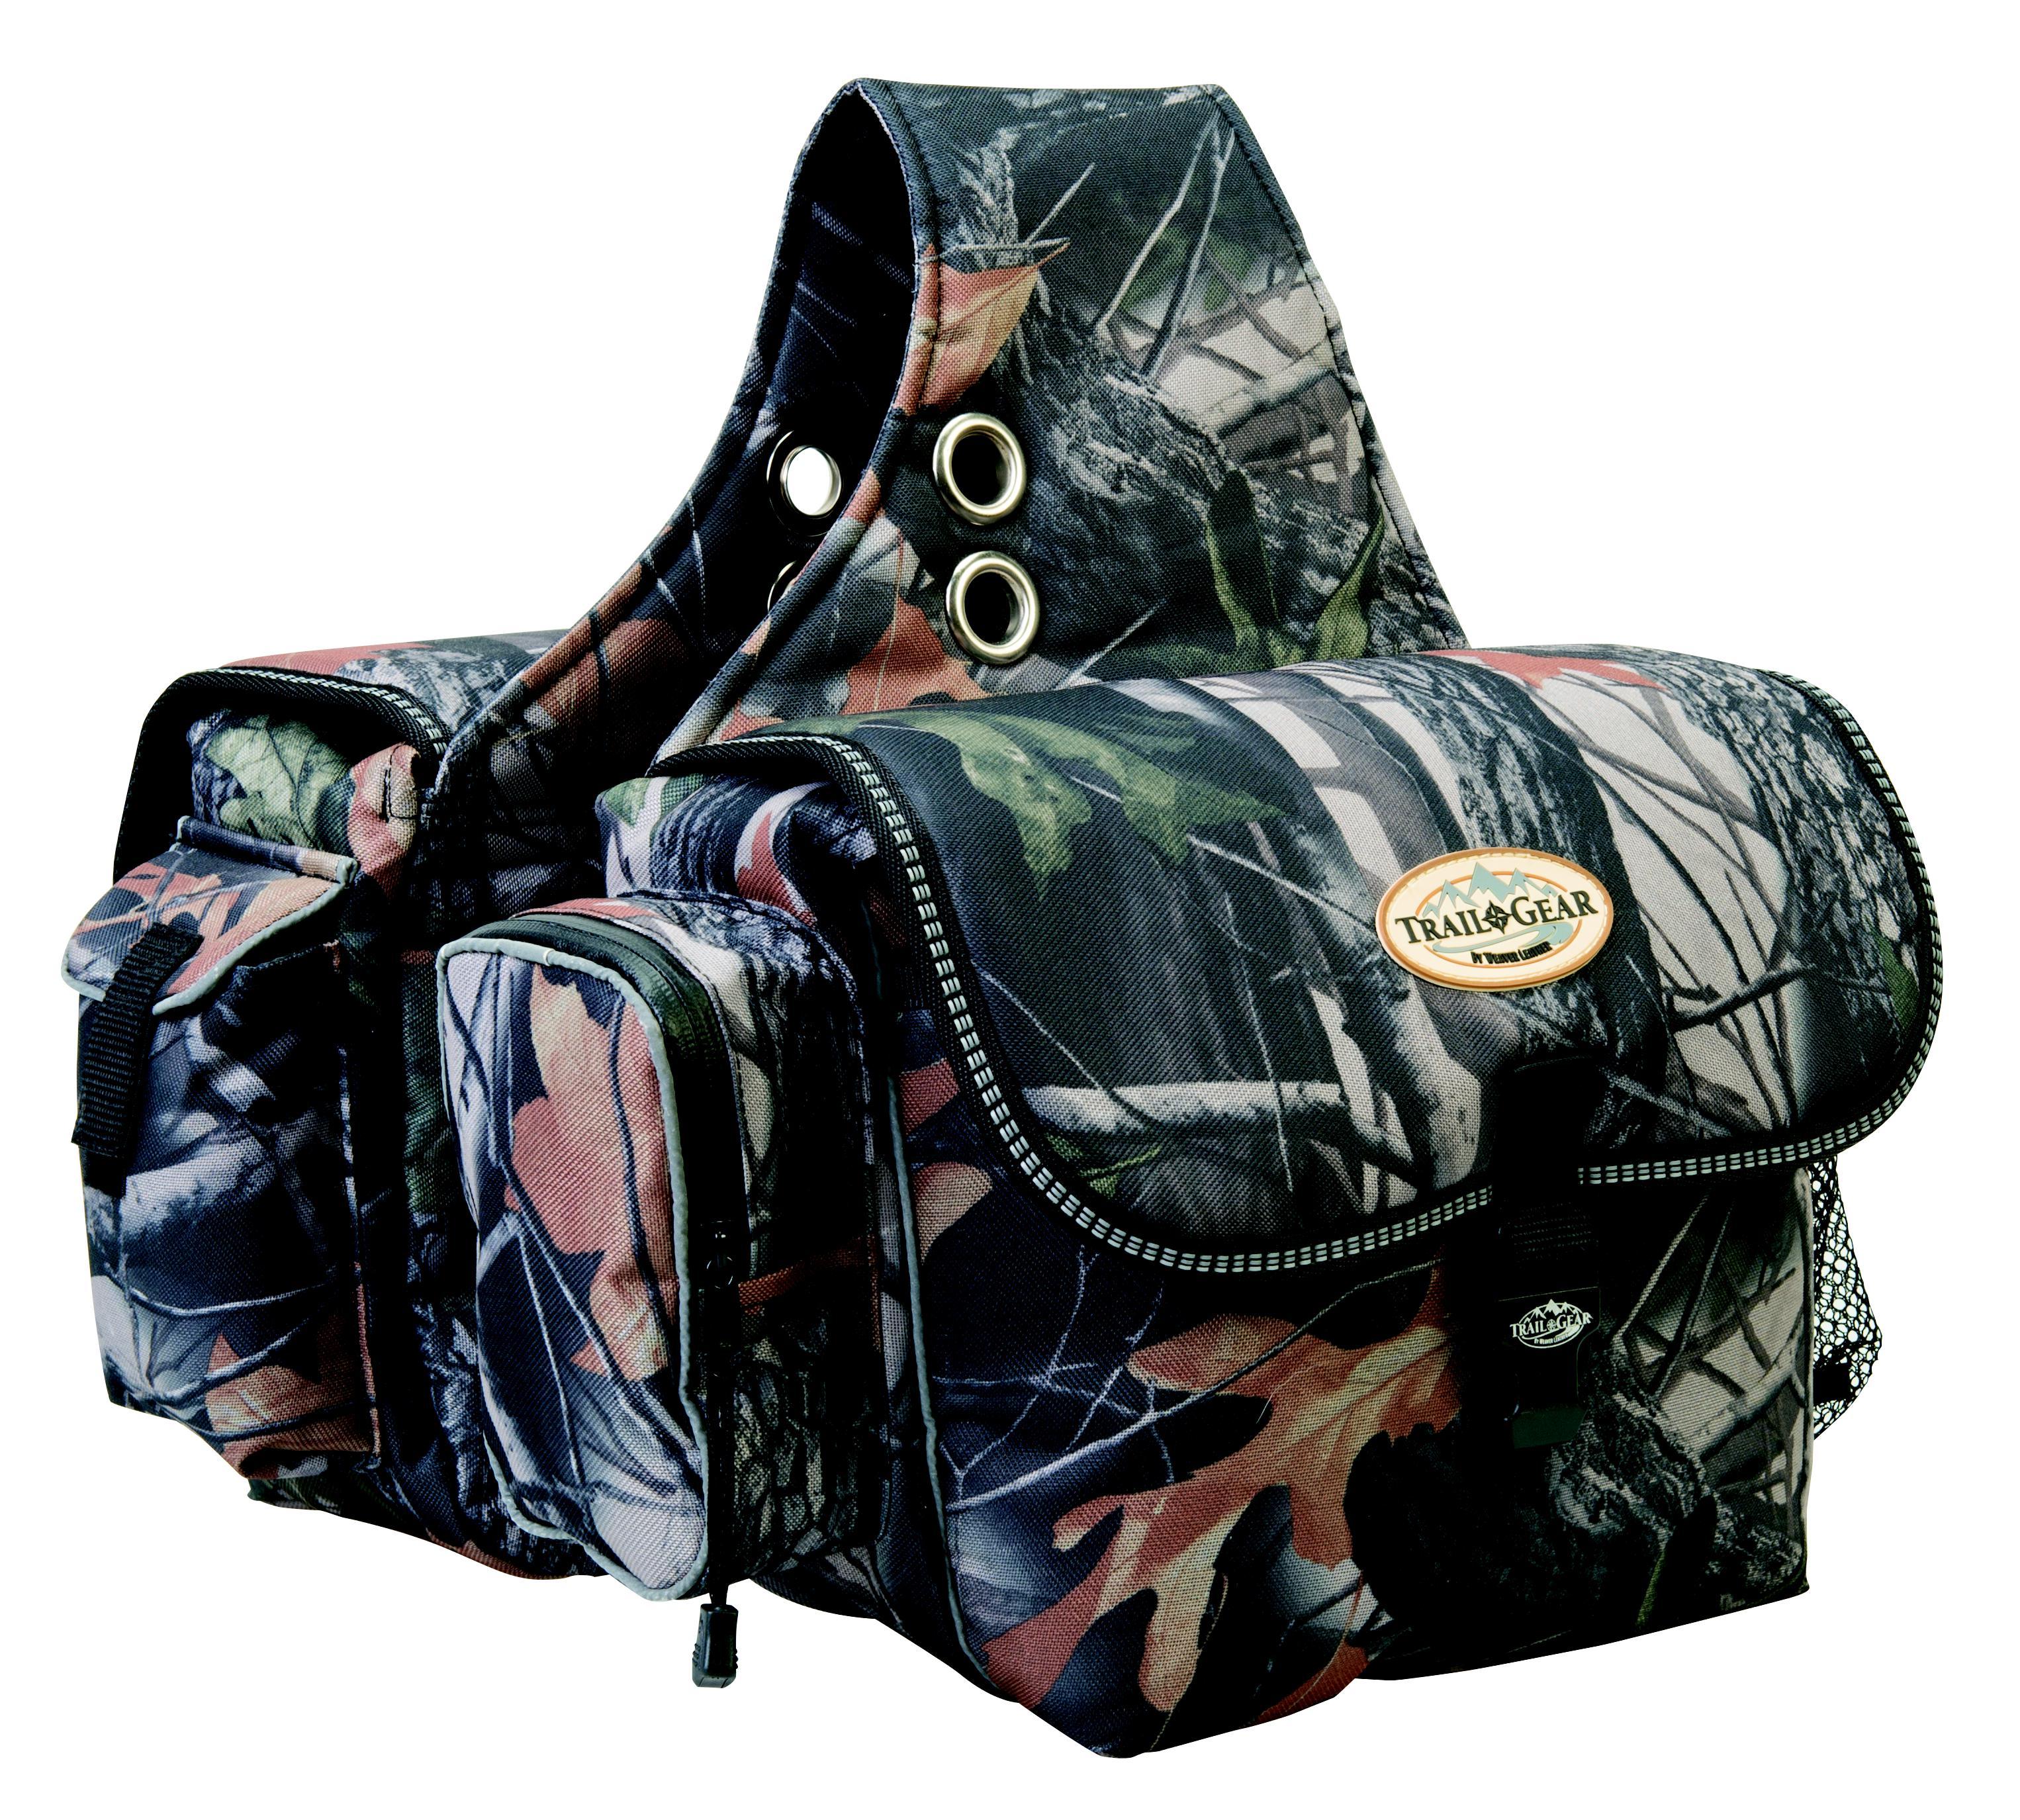 Weaver Leather Trail Gear Saddle Bag, Camo